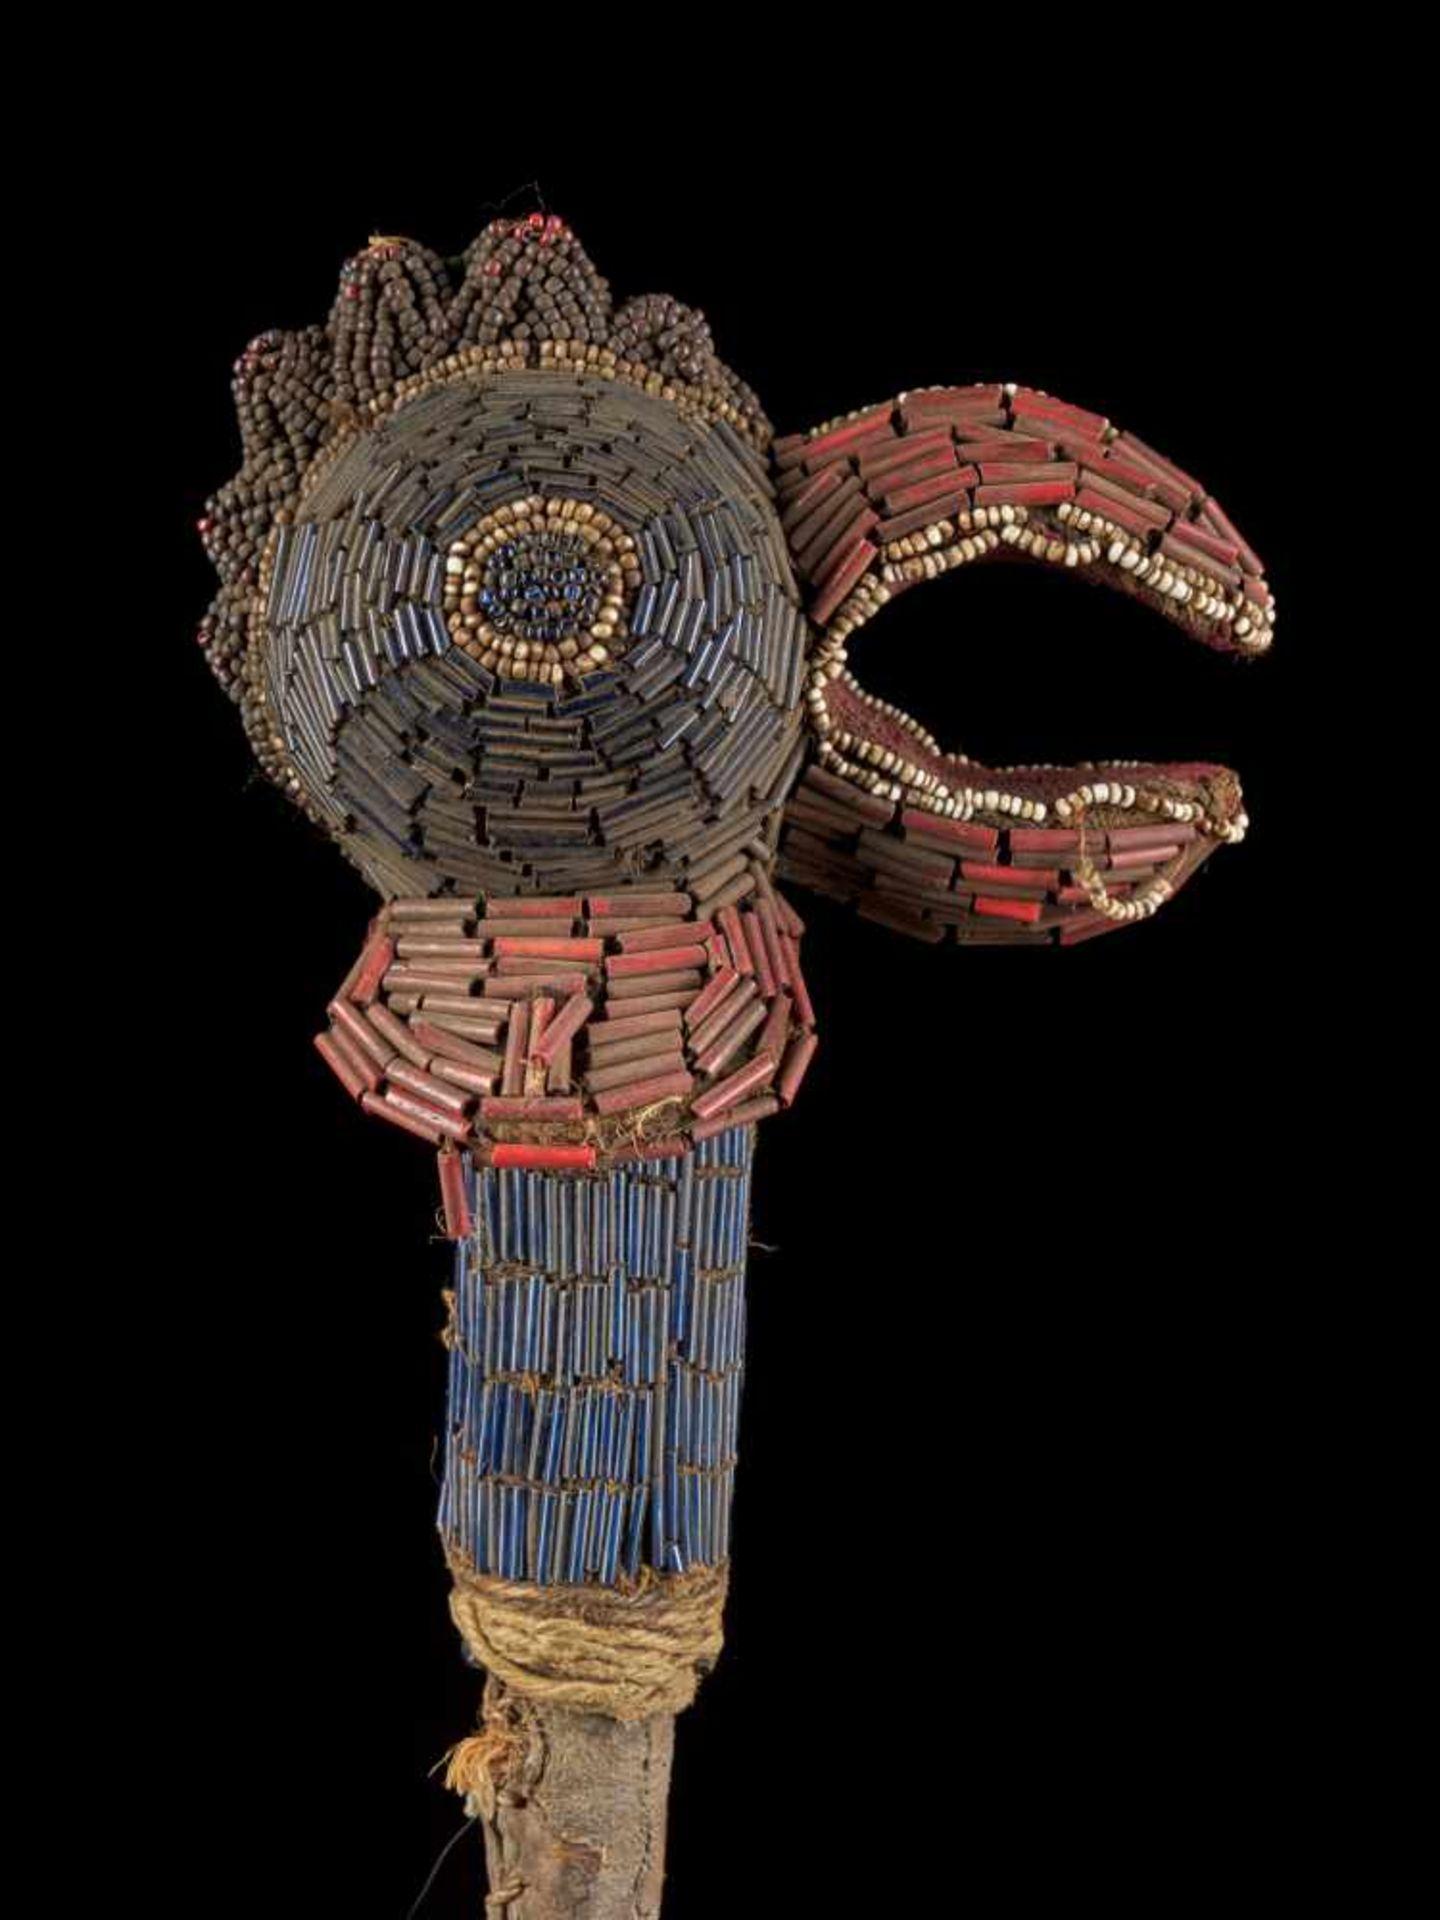 Beaded Flywhisk - Rooster - Tribal ArtThe Royal Fly Whisks (ethnic names: see leng koko or beuka) - Bild 8 aus 8